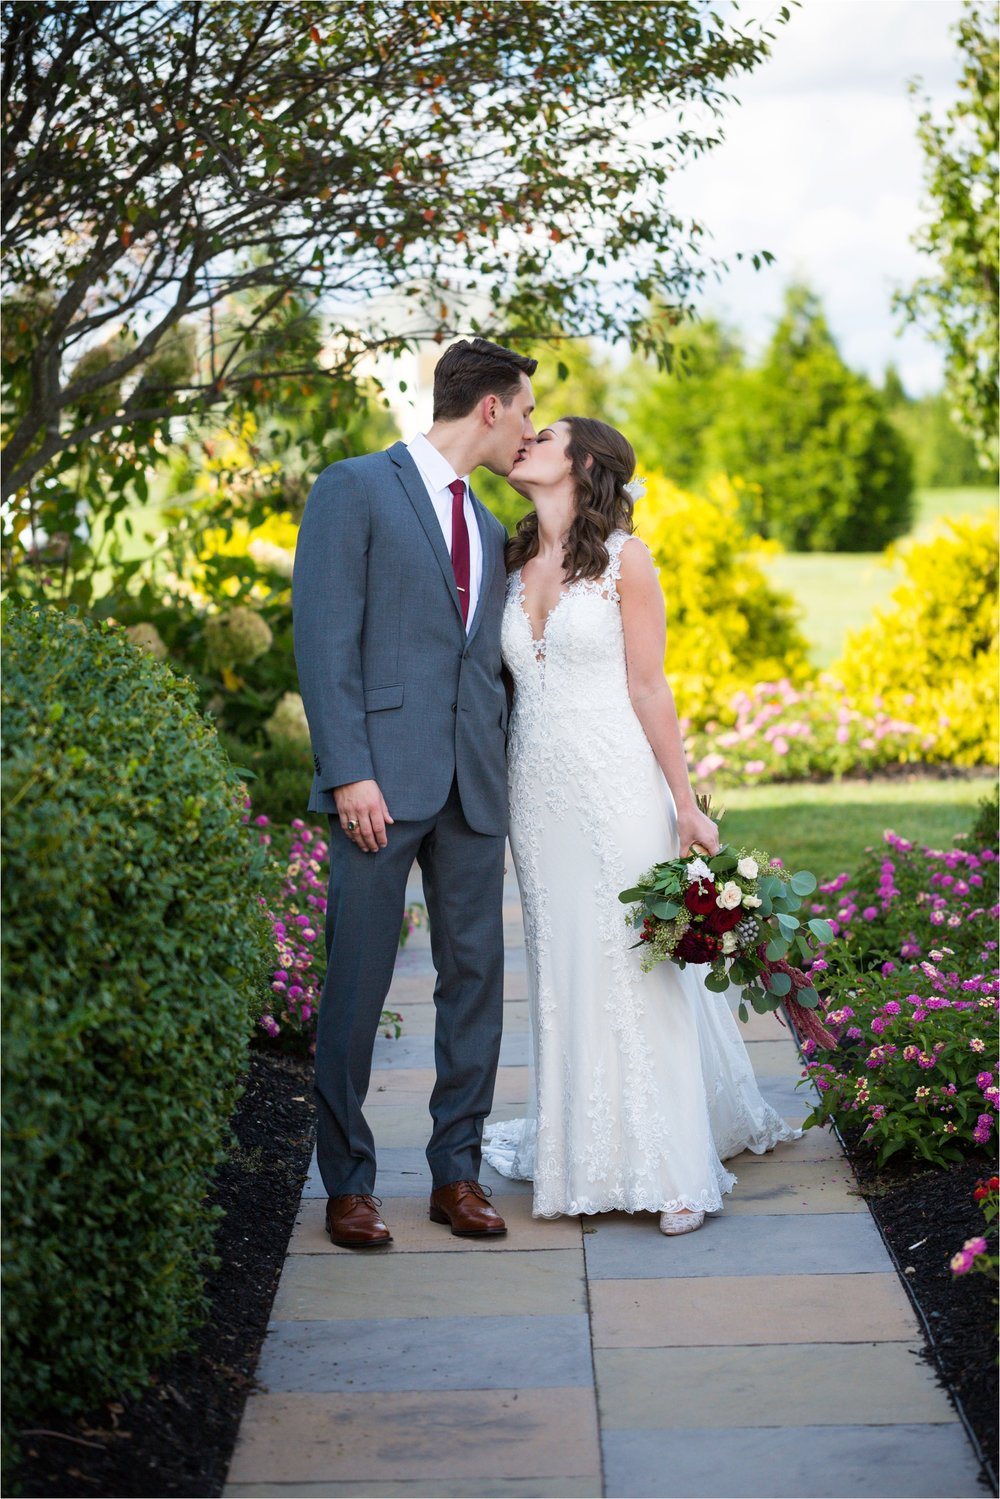 Feather-and-Oak-Photography-Cross-Keys-Vineyard-Wedding-0341.jpg